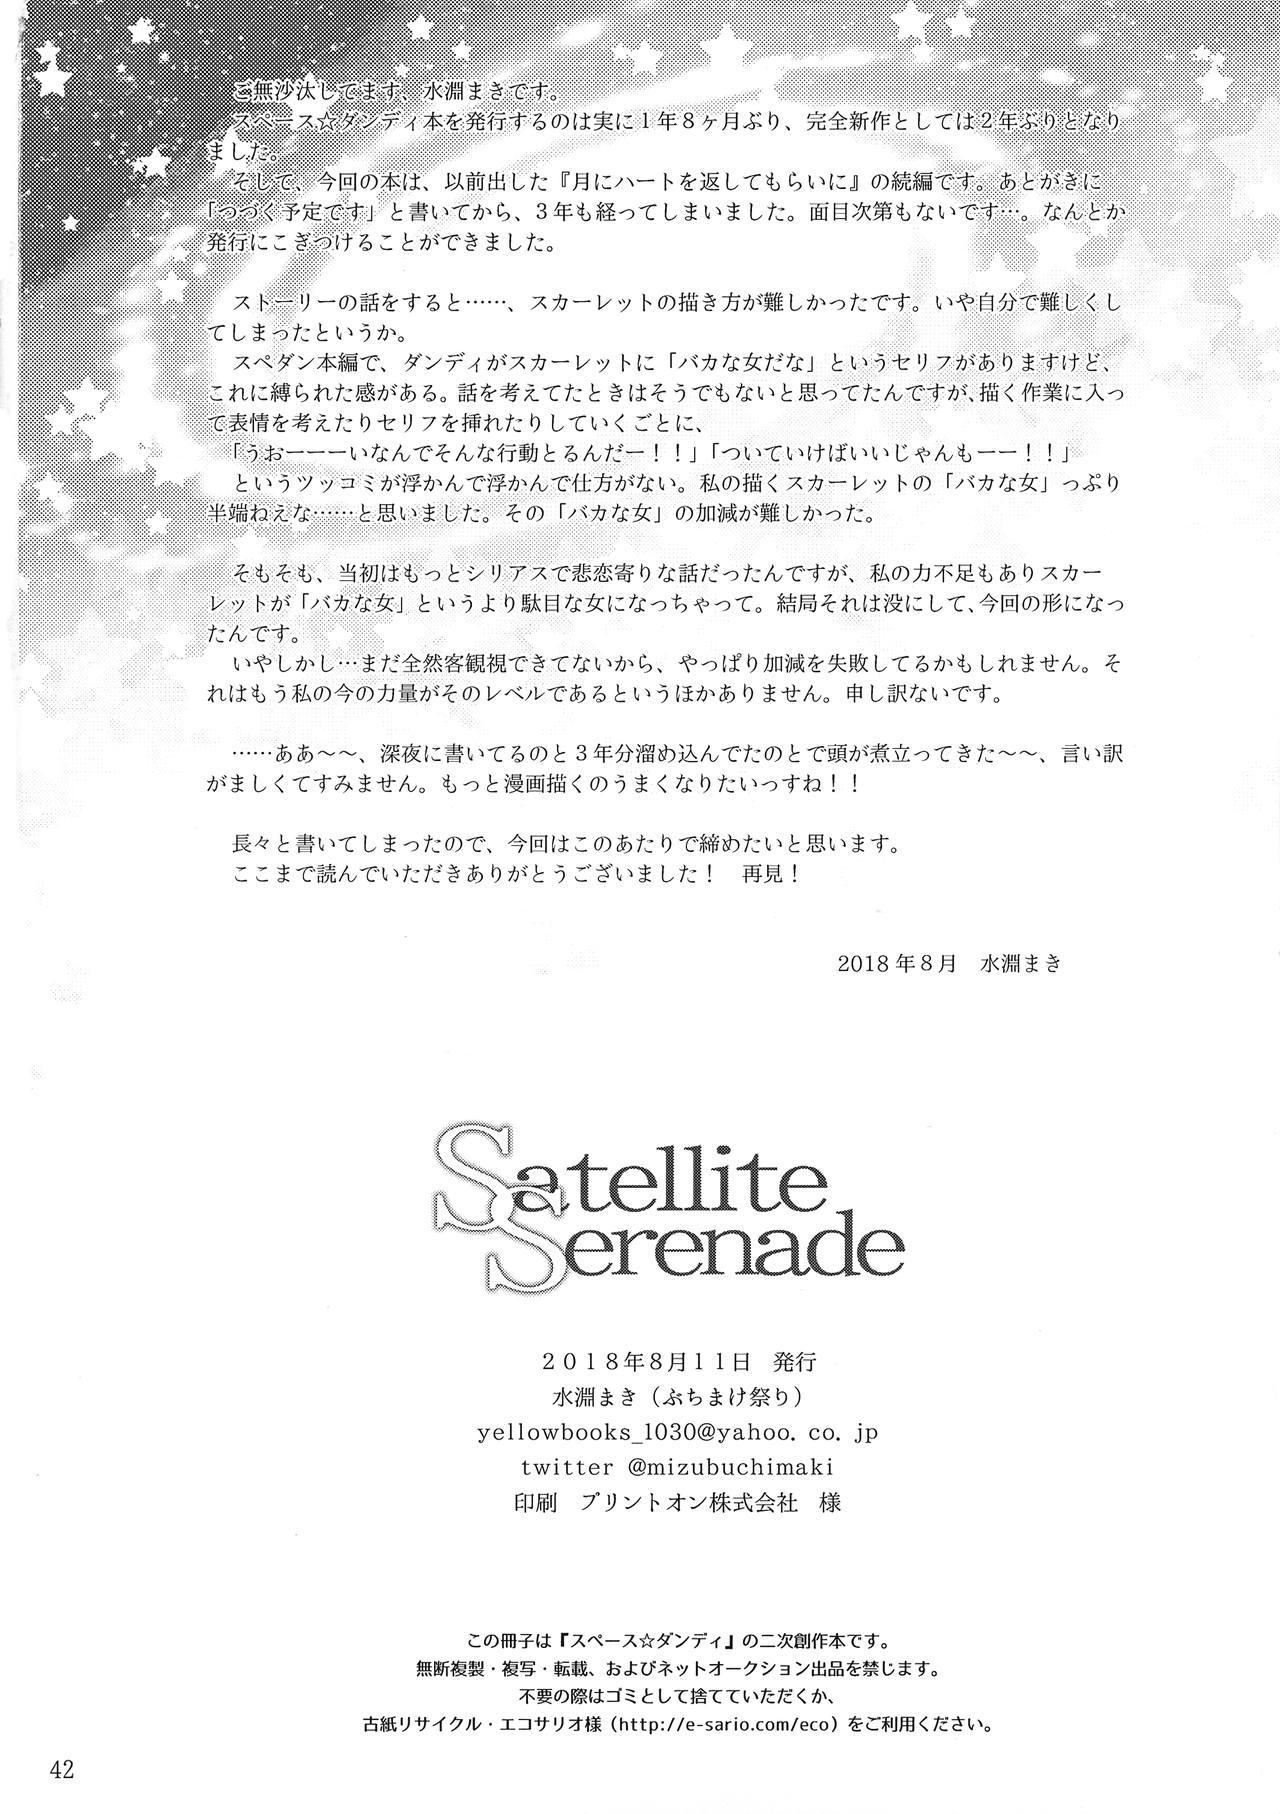 Satellite Serenade 40